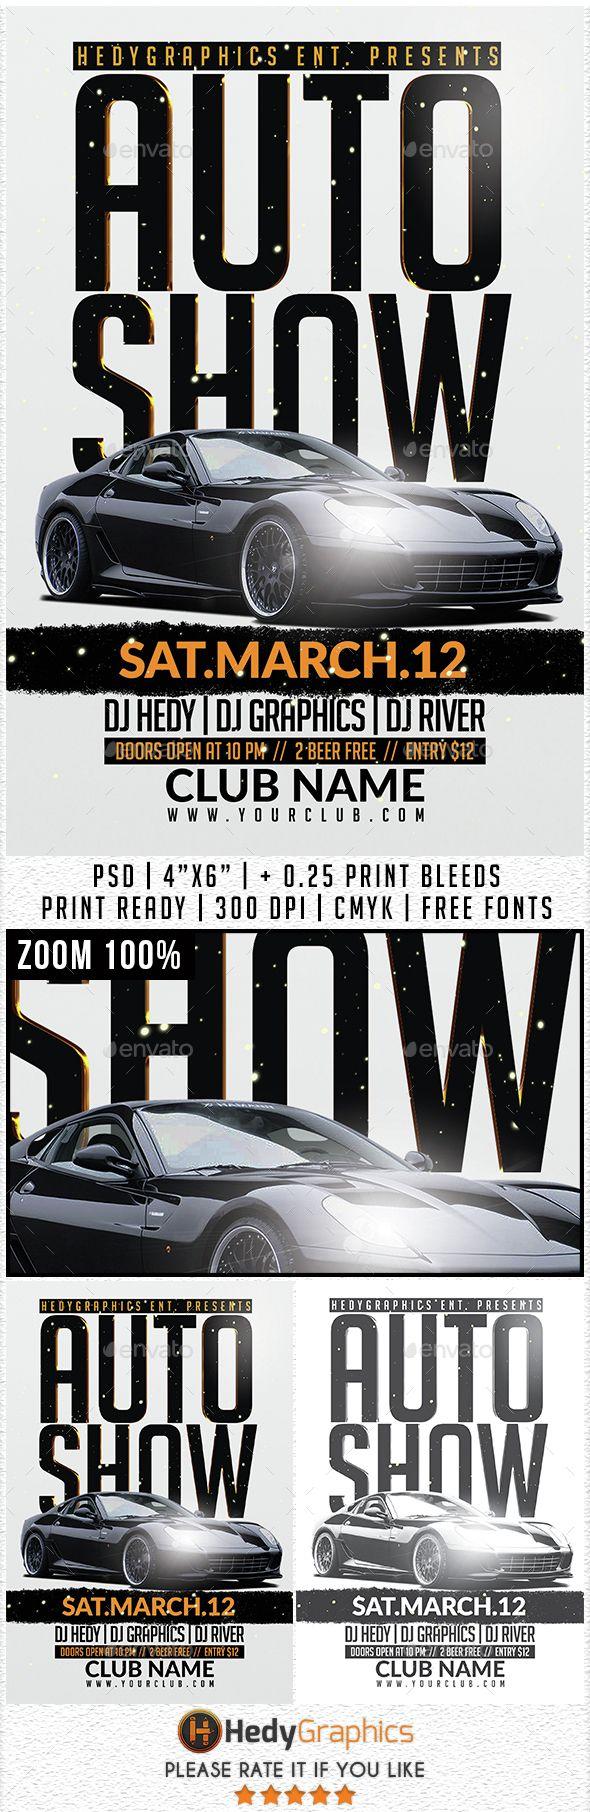 Auto Show Flyer Template Code Script Pinterest Flyer - Free car show flyer template